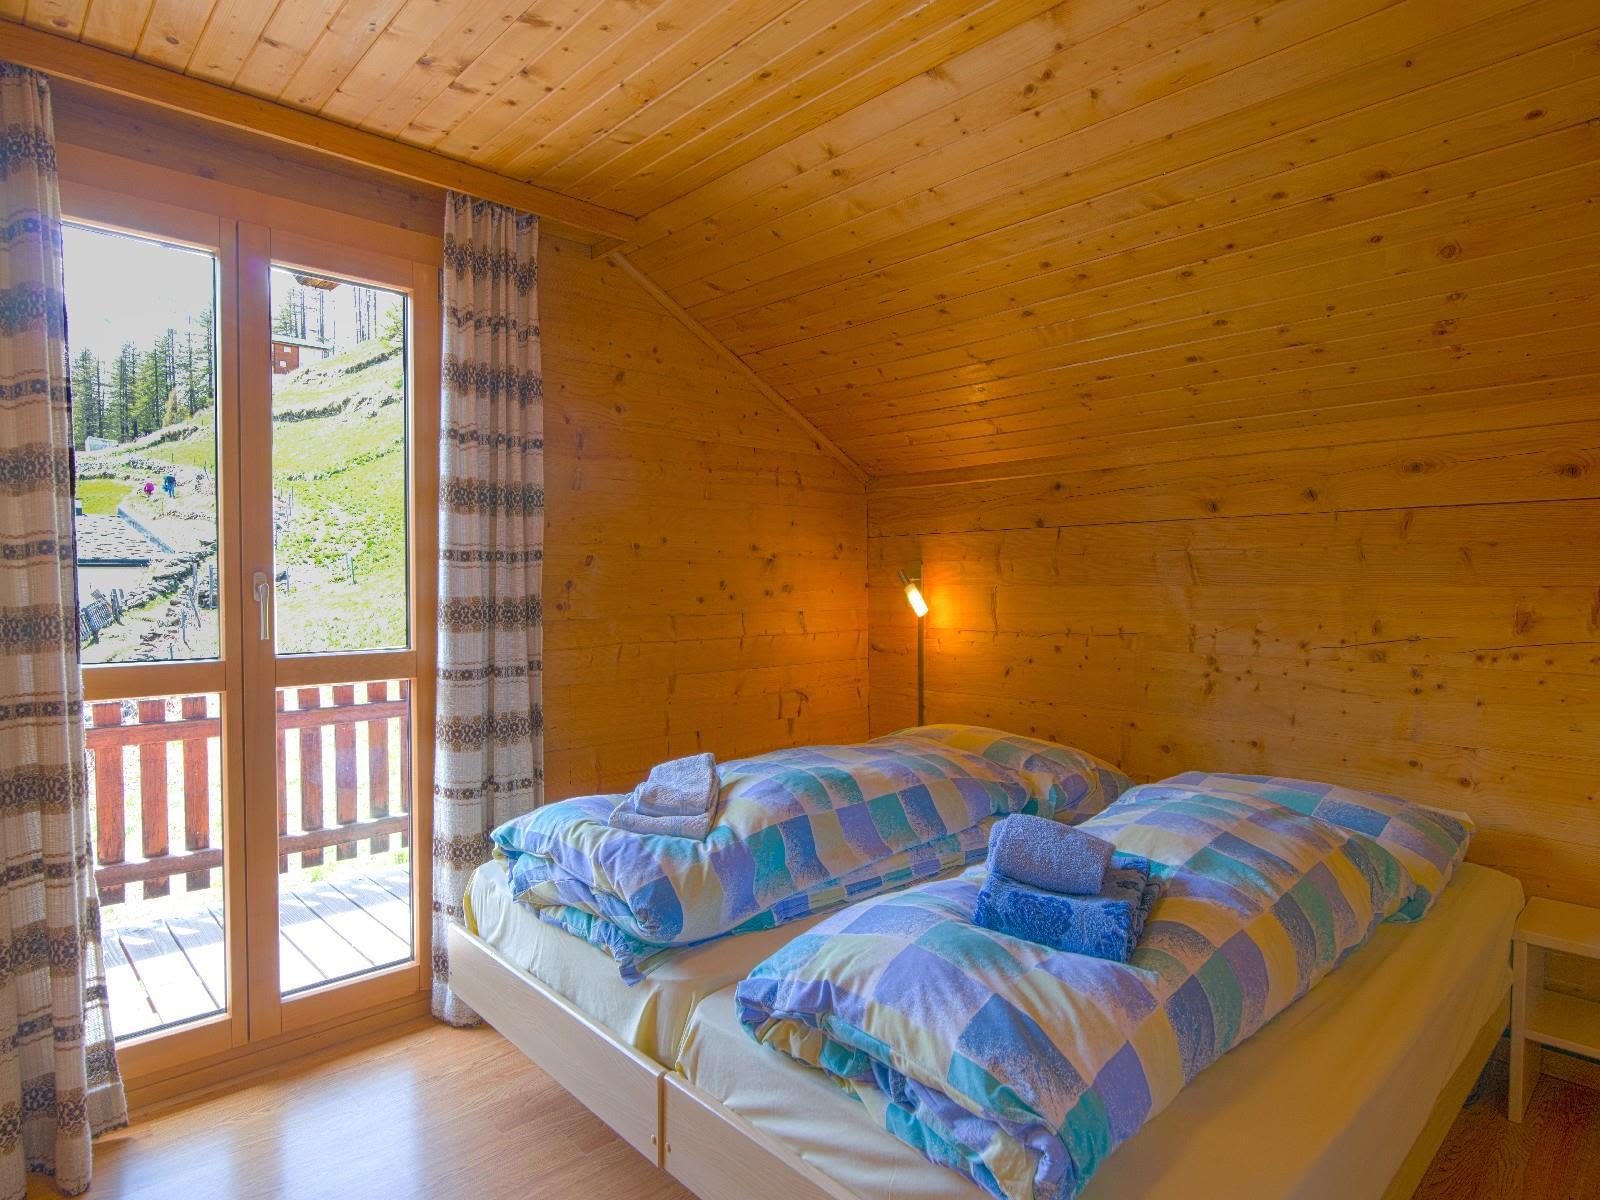 8.2 Doppelzimmer mit Balkon S